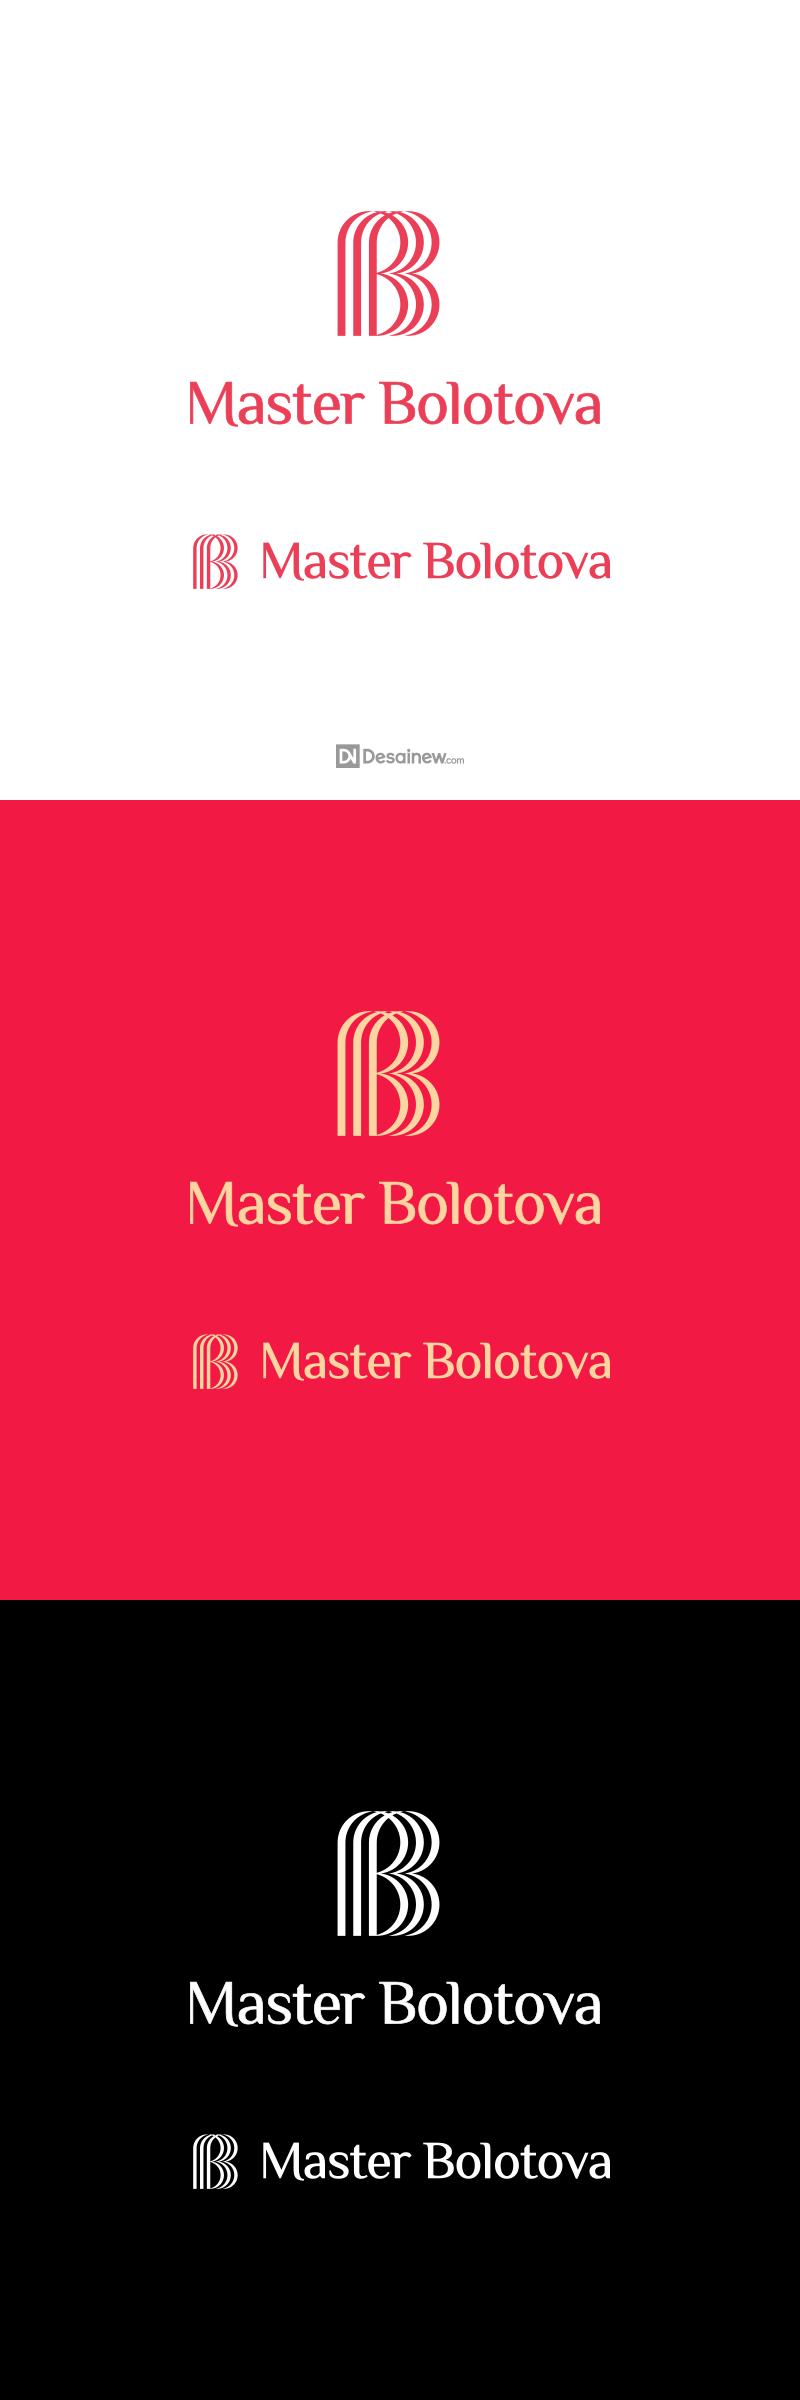 Master Bolotova Logo Design Project Portfolio Desainew Studio